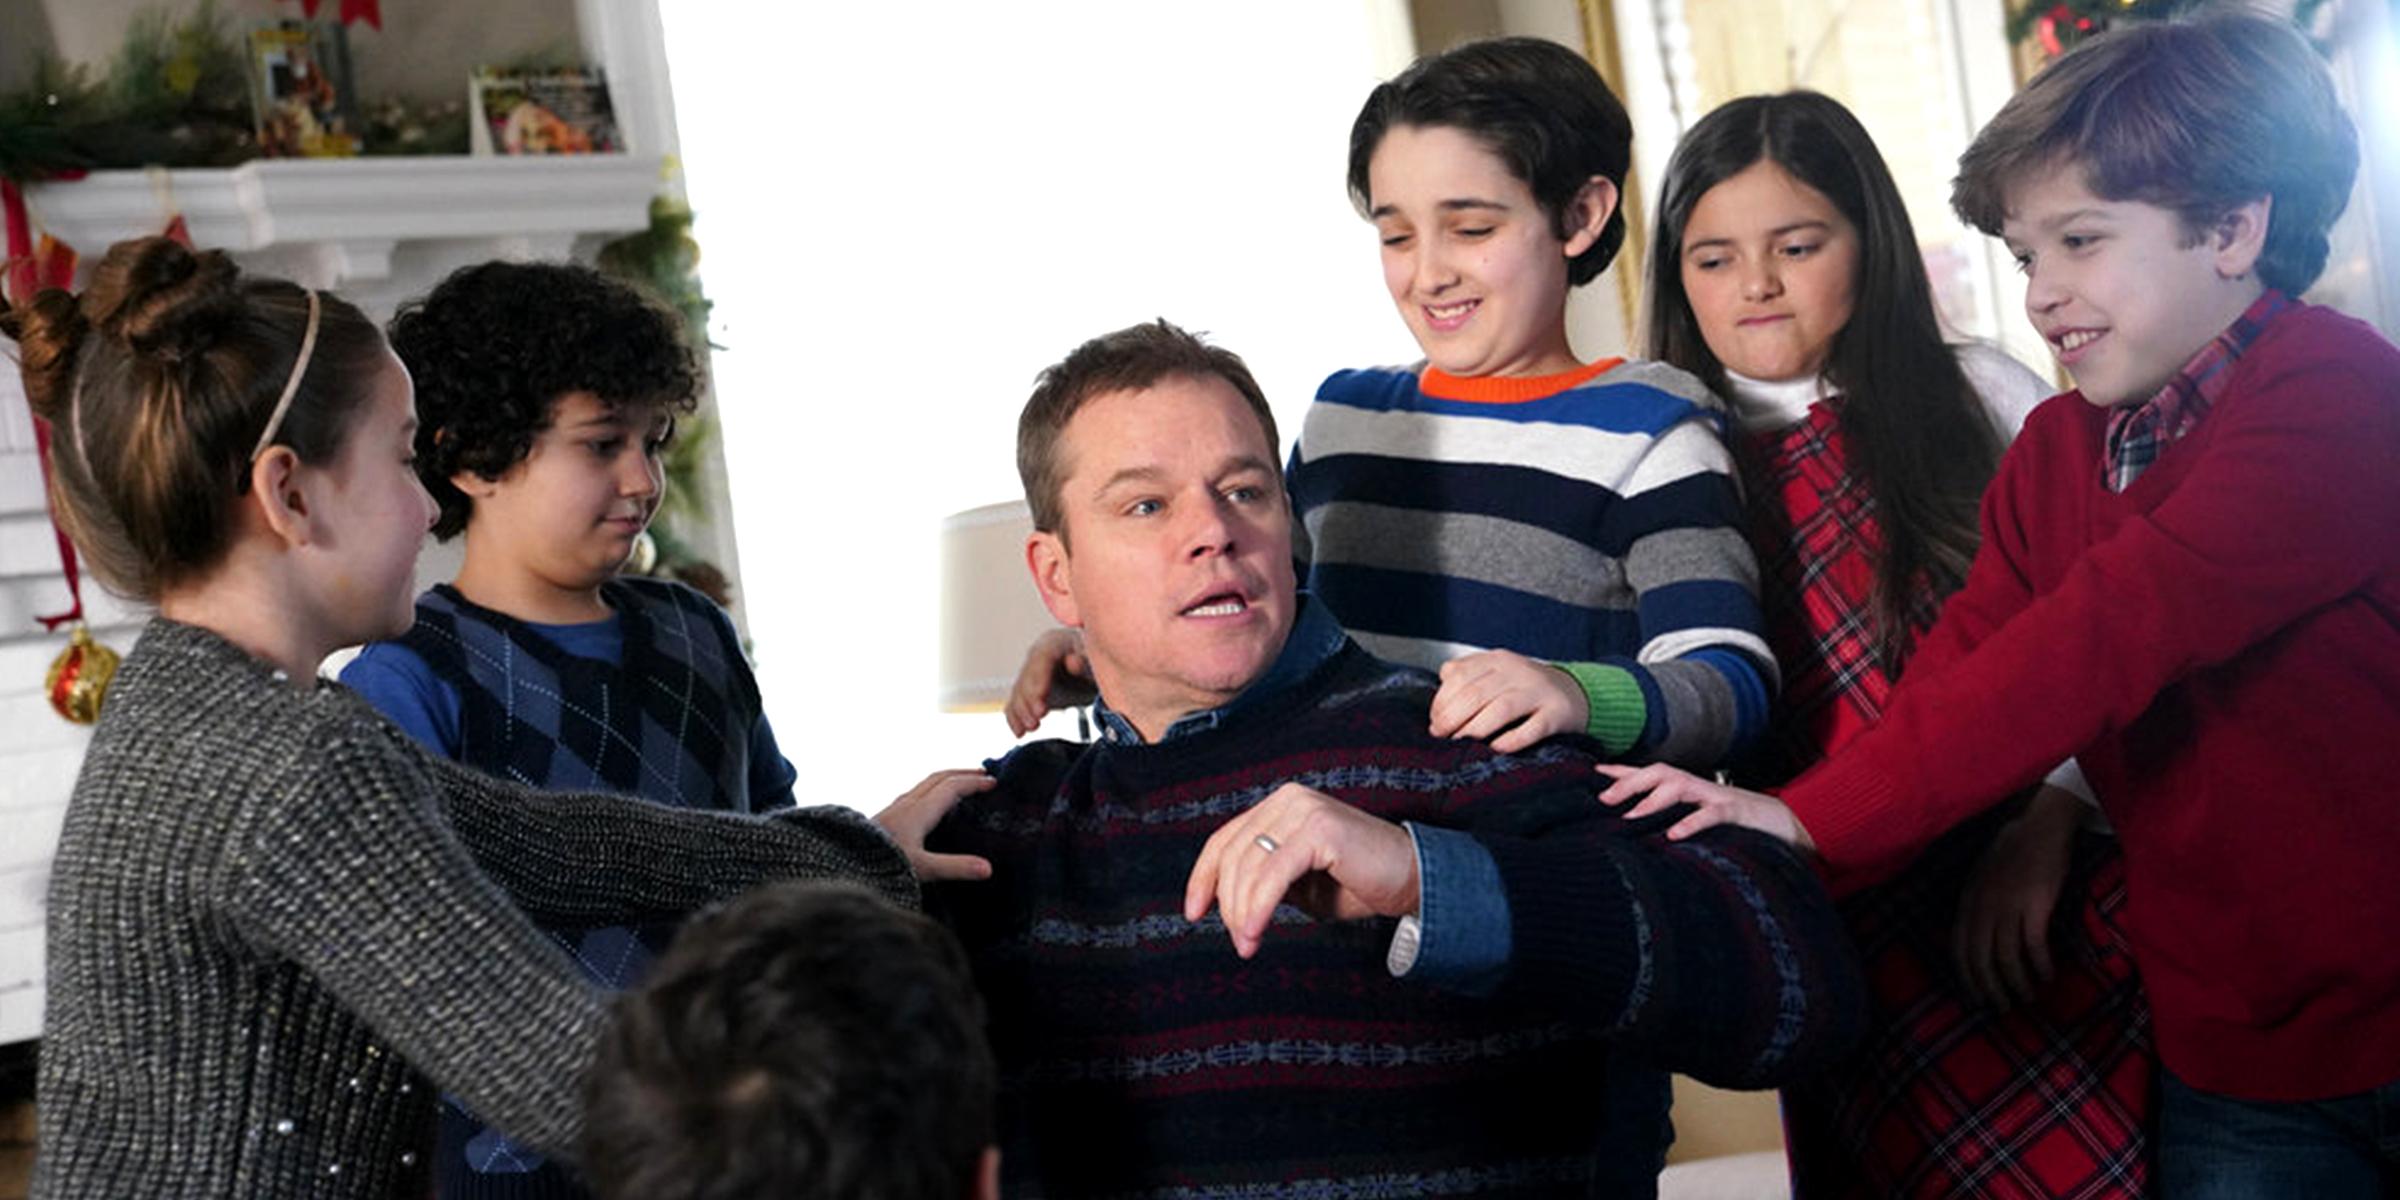 Best Christmas Ever Snl.Matt Damon S Snl Skit About Parenting Stress During The